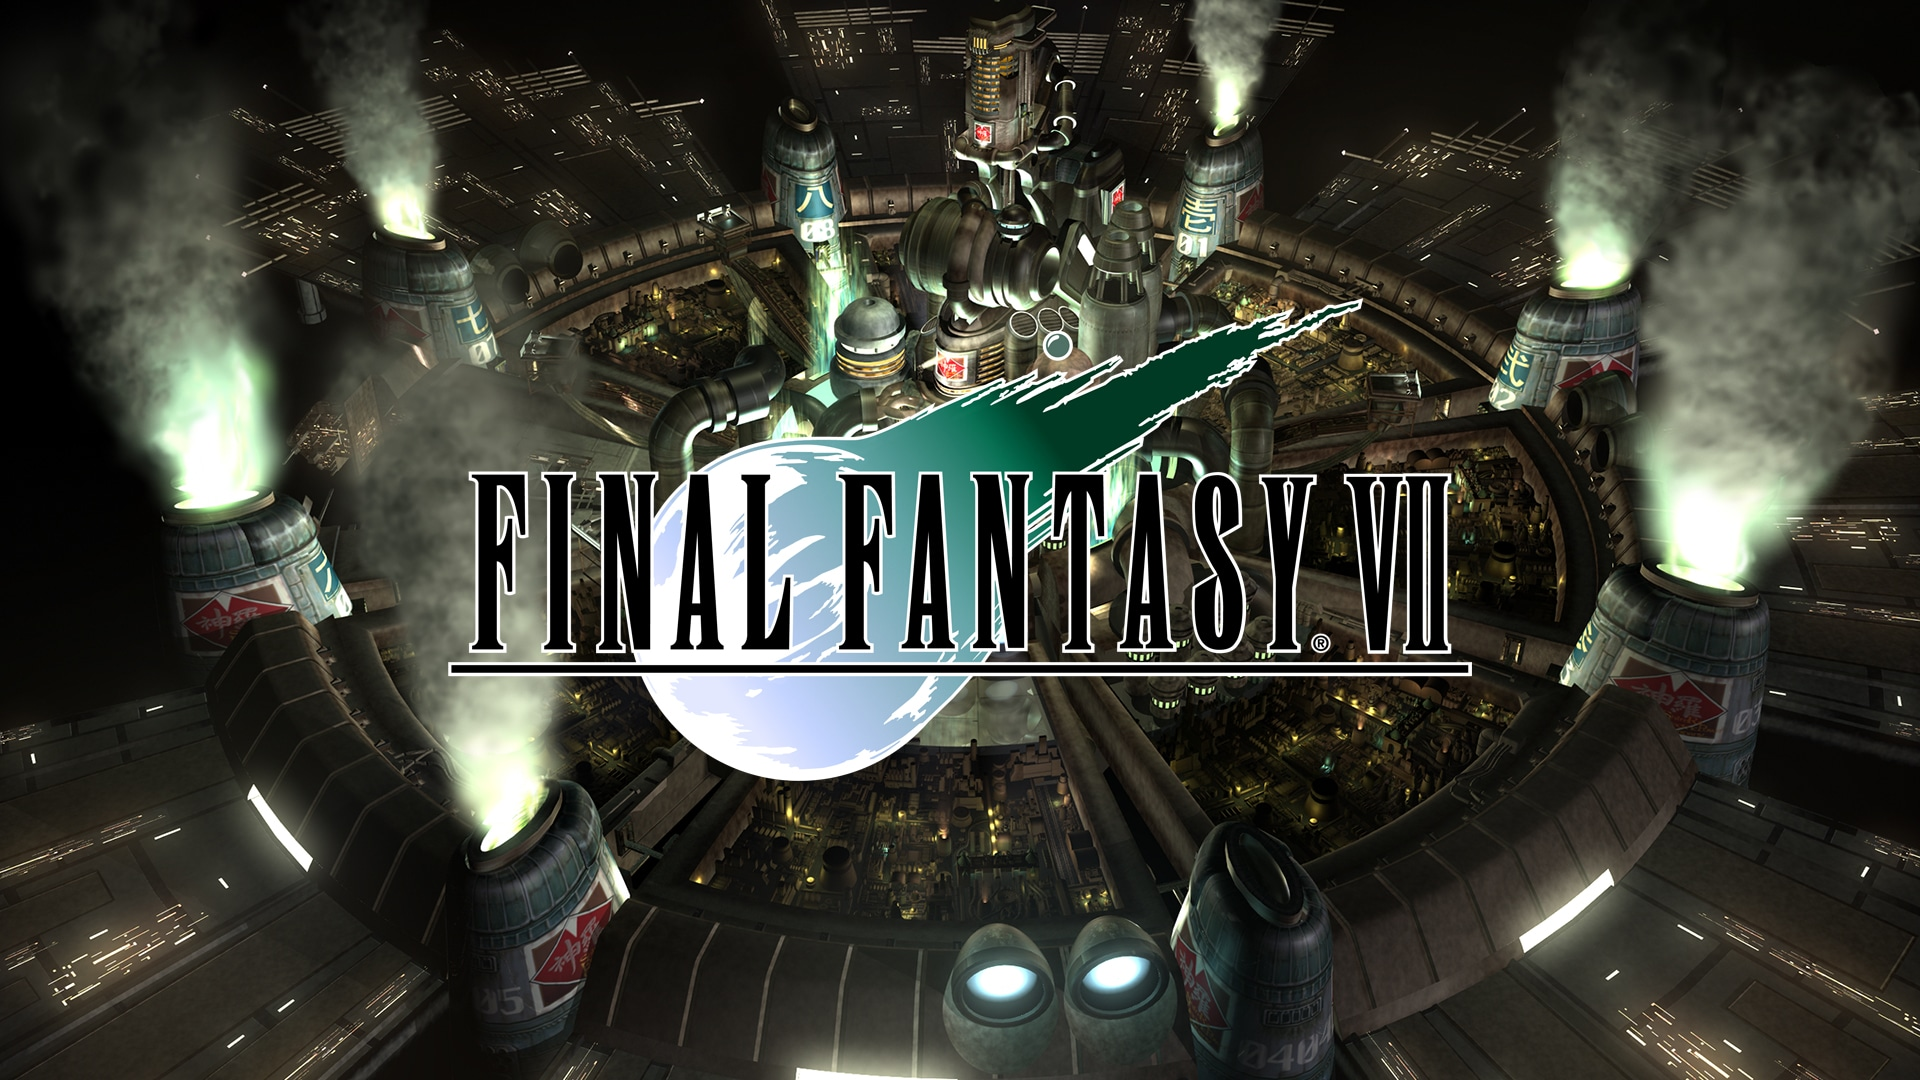 Final Fantasy VII Logo Poster